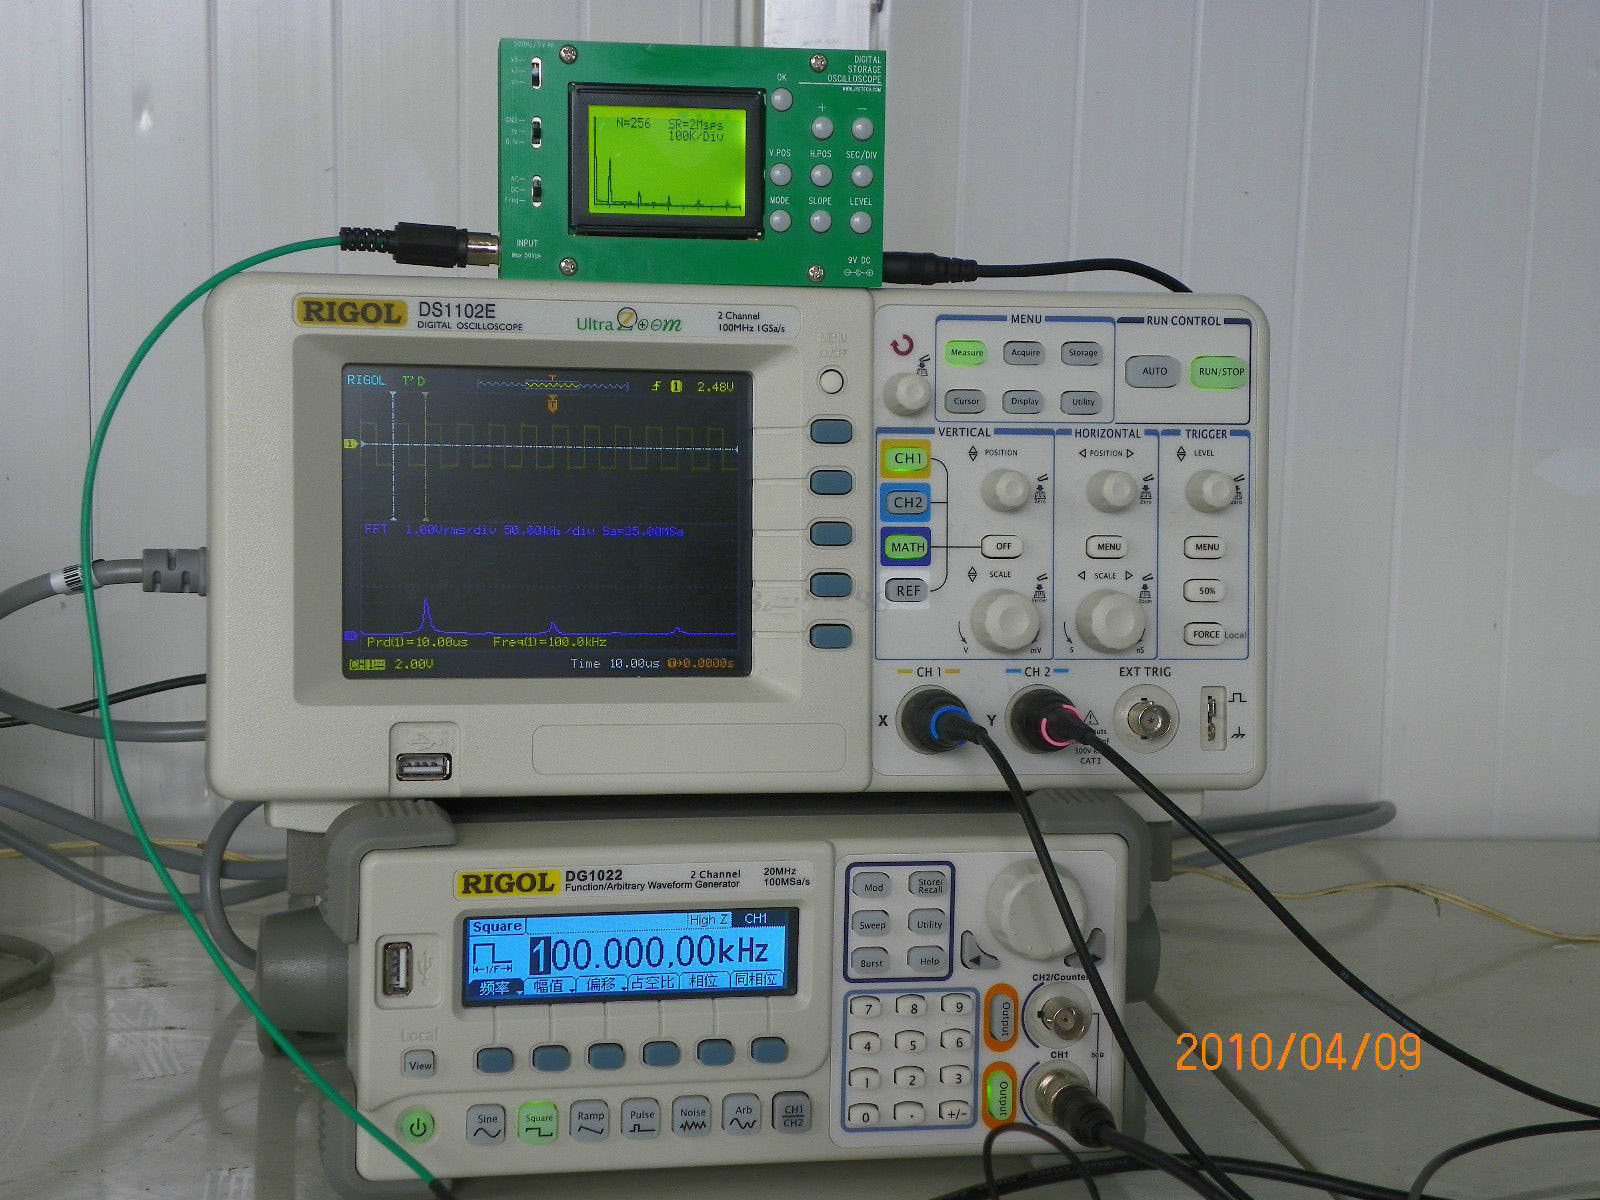 Diy Oscilloscope  DSO062 Mini Digital Oscilloscope 1MHz Analog Bandwidth